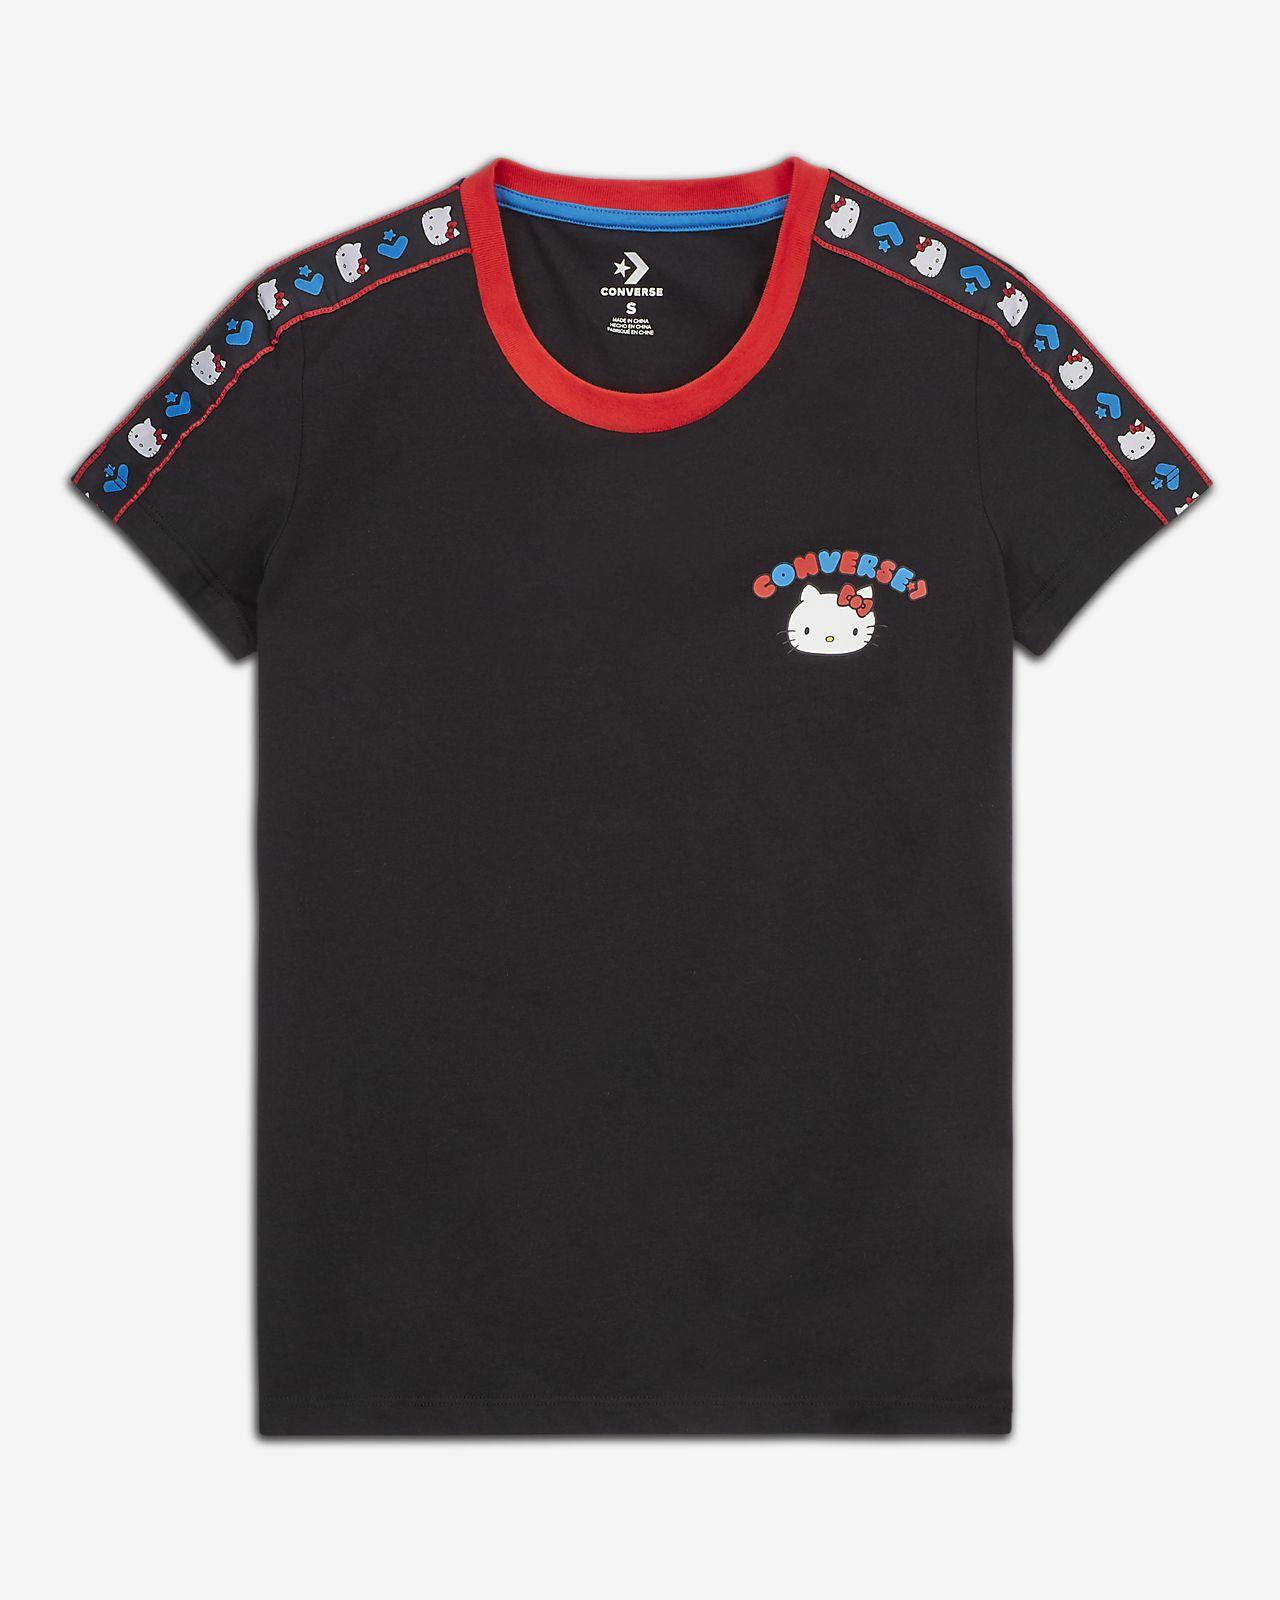 Converse x Hello Kitty  Women's Tape T-Shirt